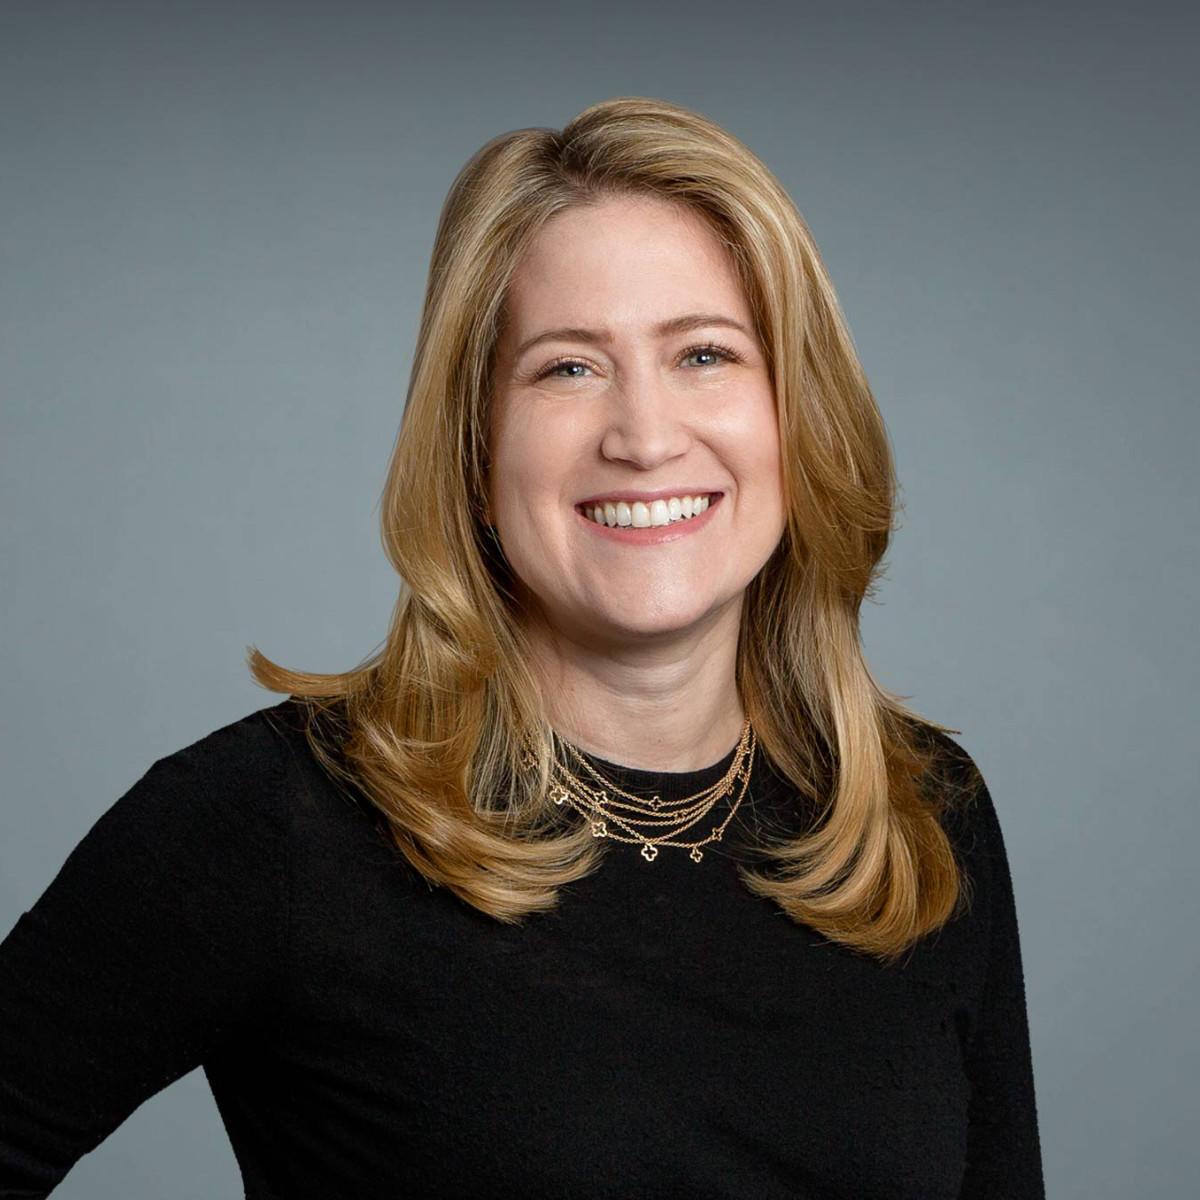 Rachel Bluebond-Langner, MD